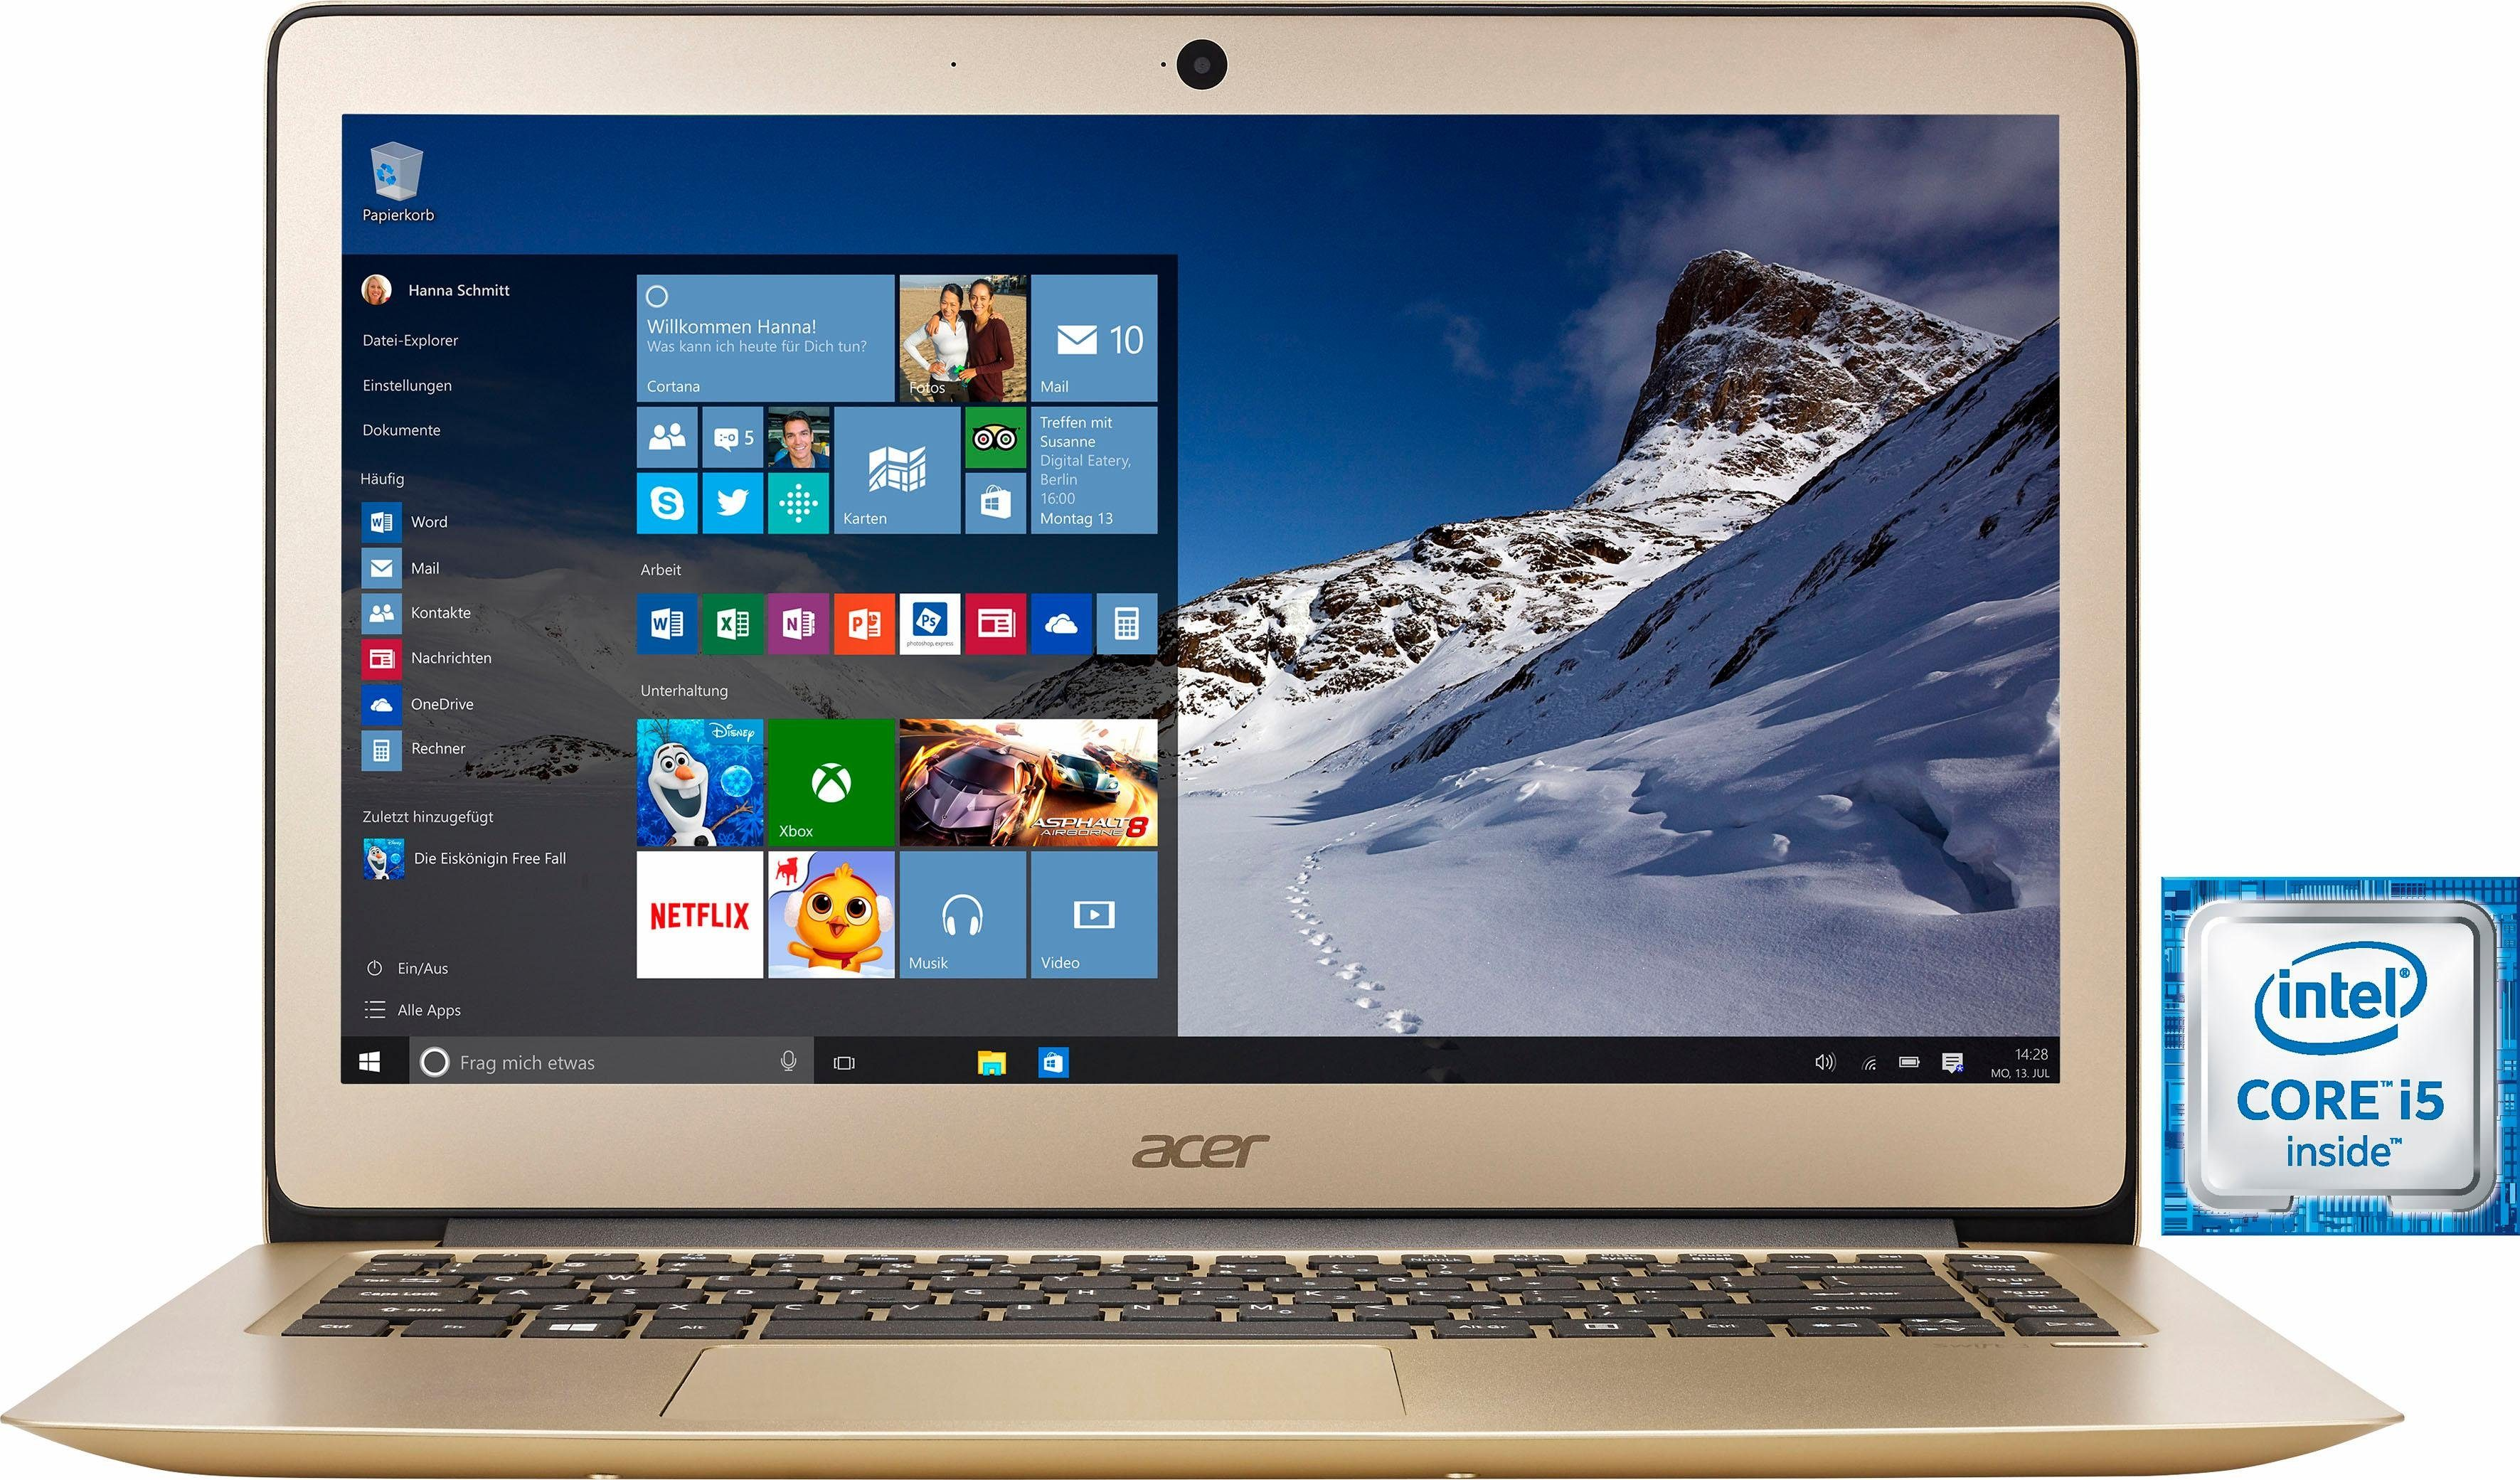 Acer Swift SF314-51-53TU Notebook, Intel® Core™ i5, 35,6 cm (14 Zoll), 256 GB Speicher